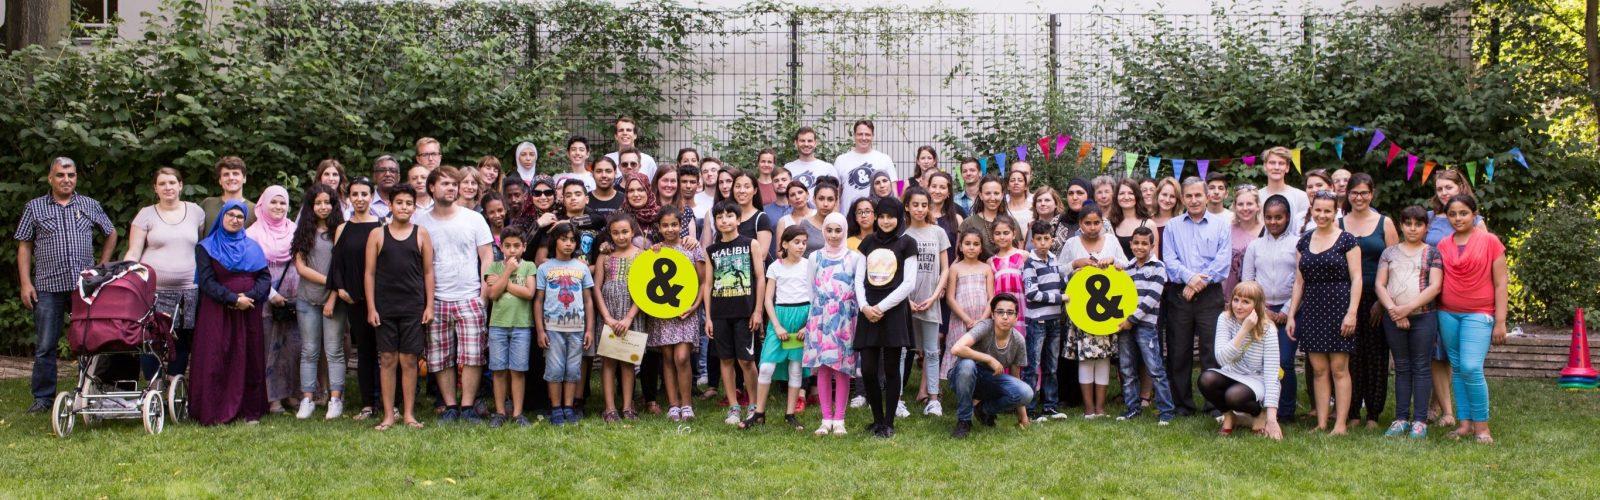 Sommerfest Gruppenfoto